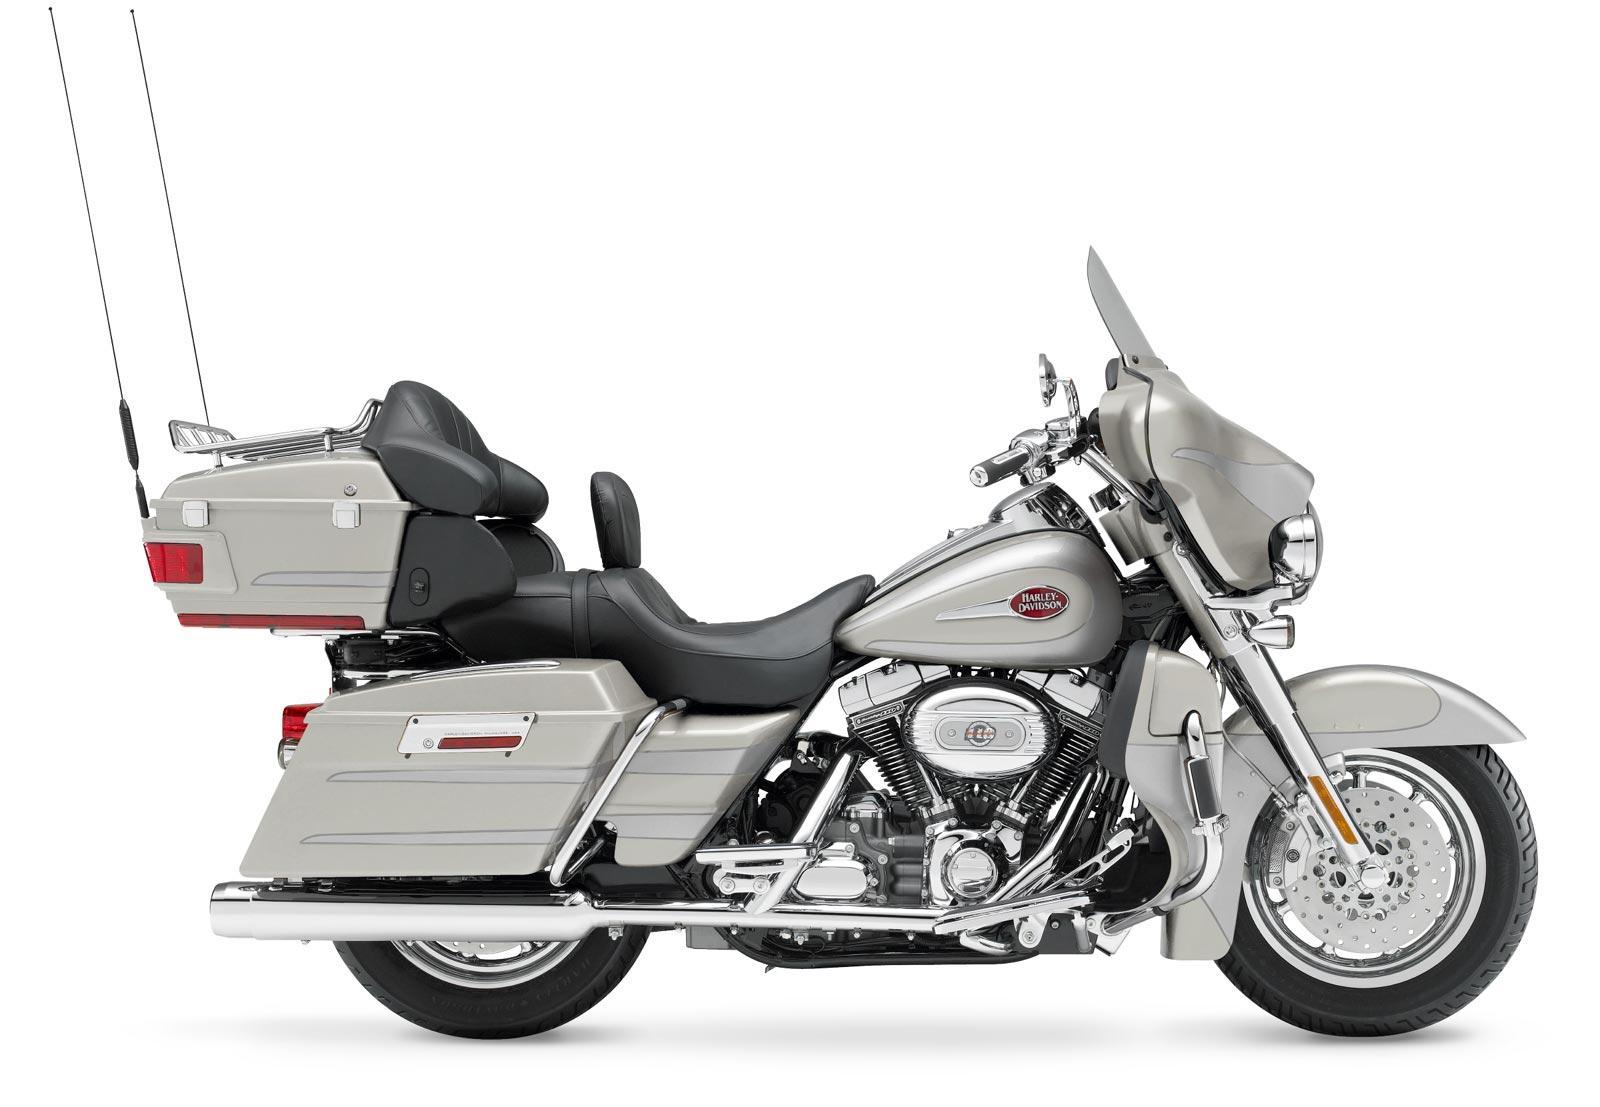 Harley Davidson Cvo Ultra Classic Electra Glide Specs